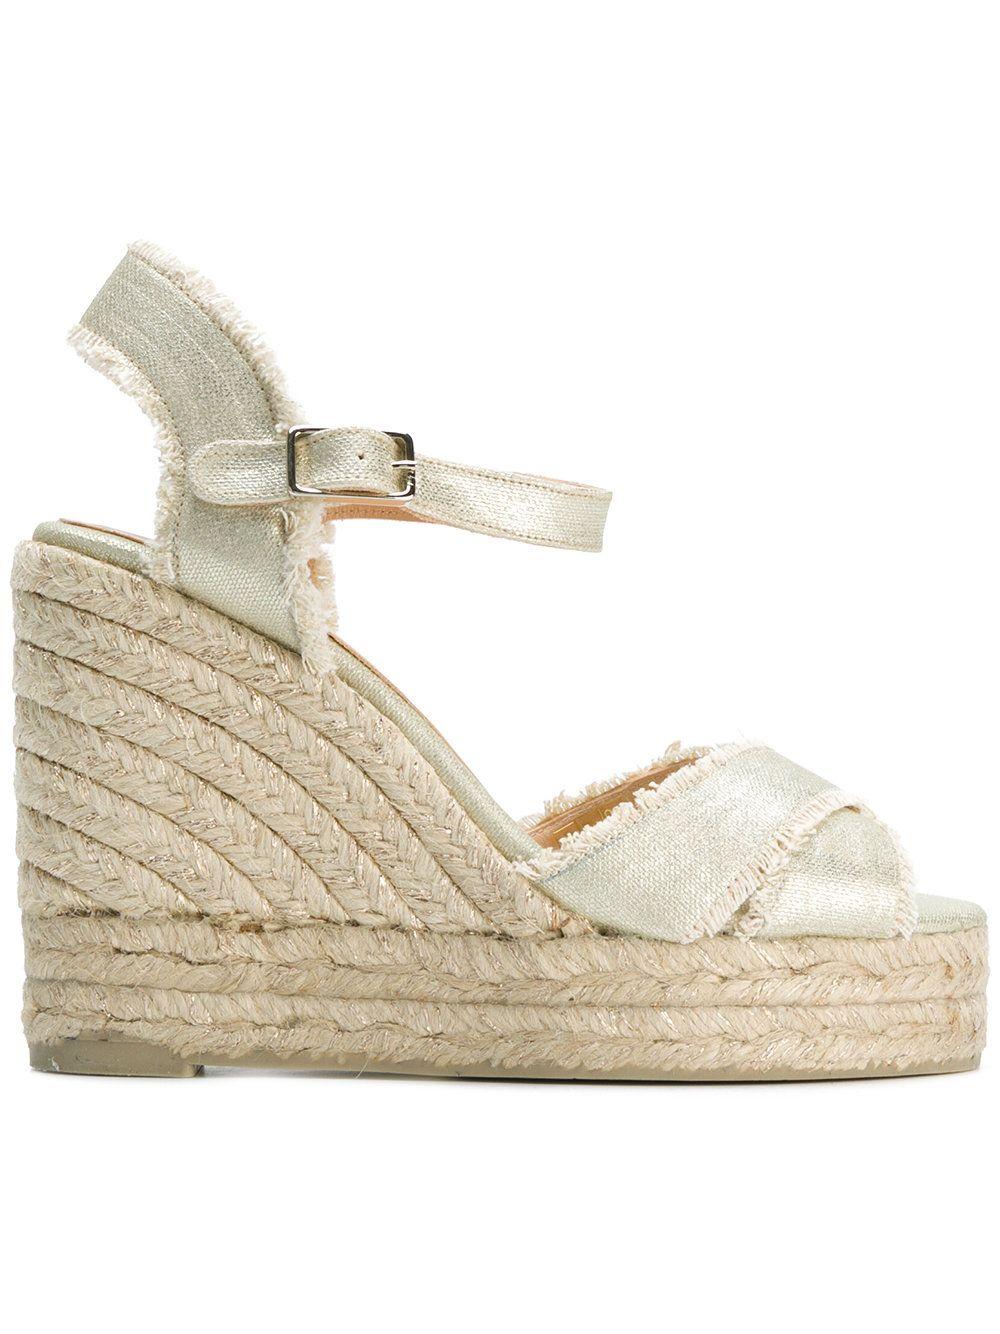 wedge espadrille sandals - Nude & Neutrals Castaner Discount Hot Sale Cheap 100% Original uhPCb0